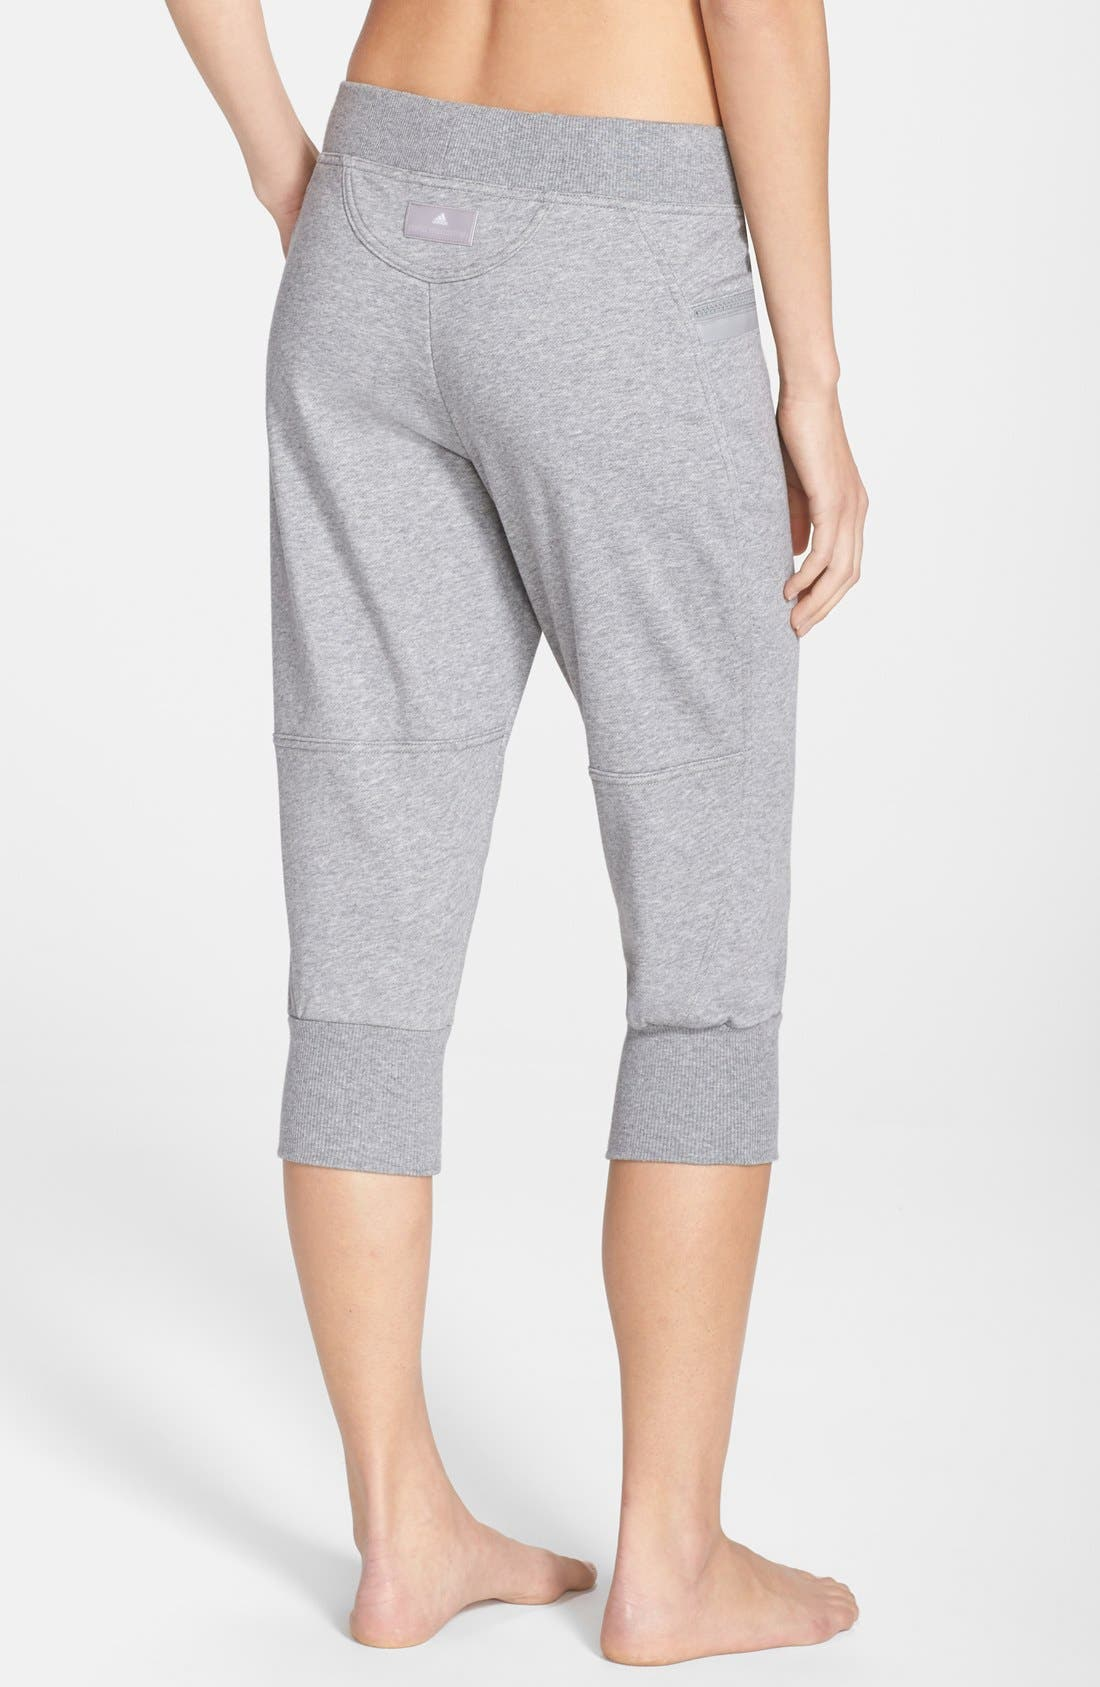 Alternate Image 2  - adidas by Stella McCartney 'Ess' Organic Cotton Sweatpants